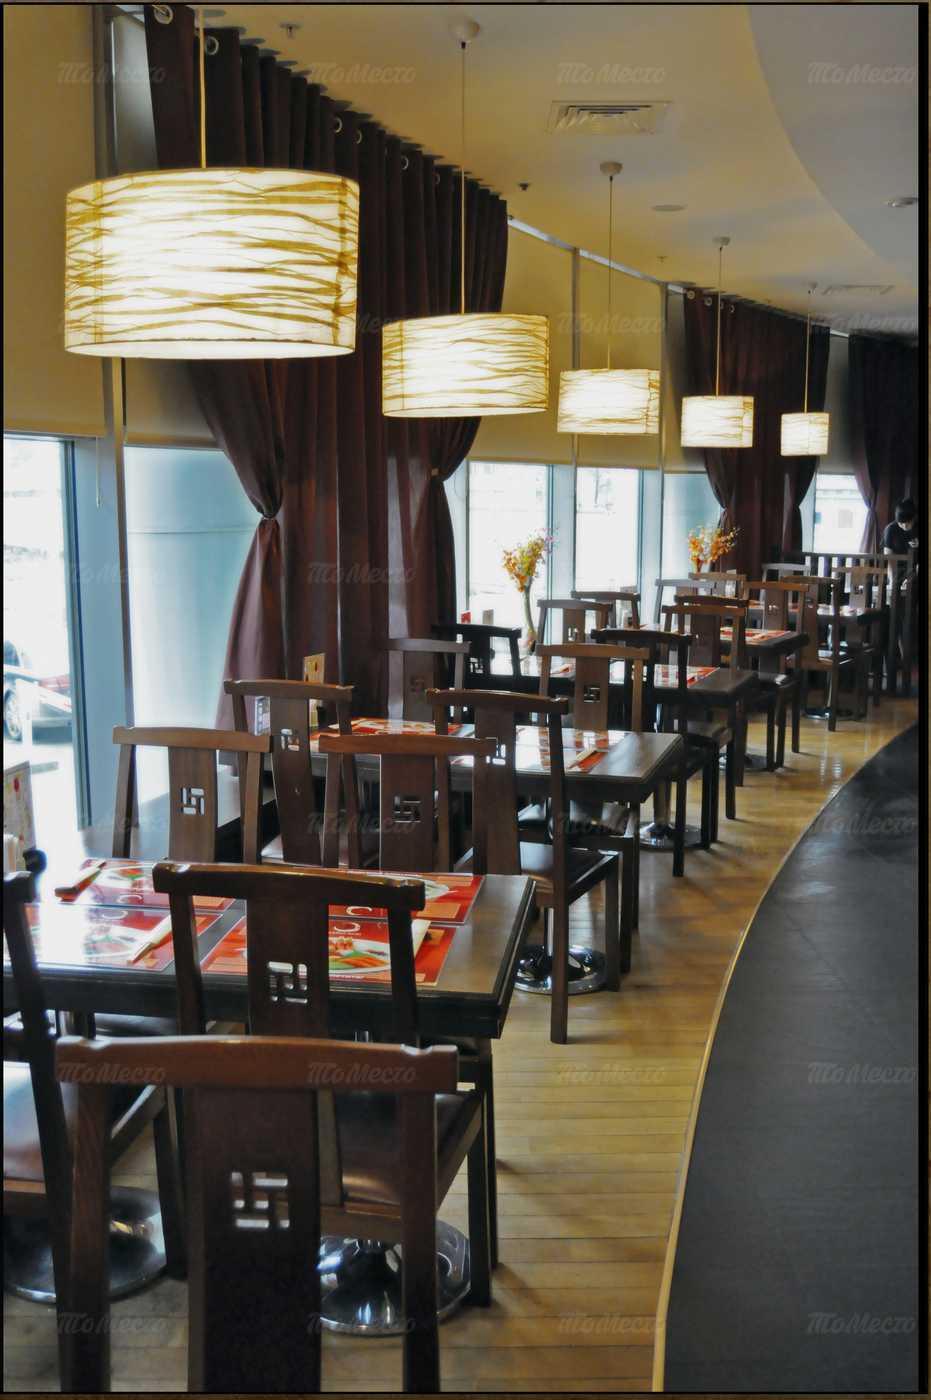 Меню ресторана Ичибан Боши (Ichiban Boshi) на улице Правды